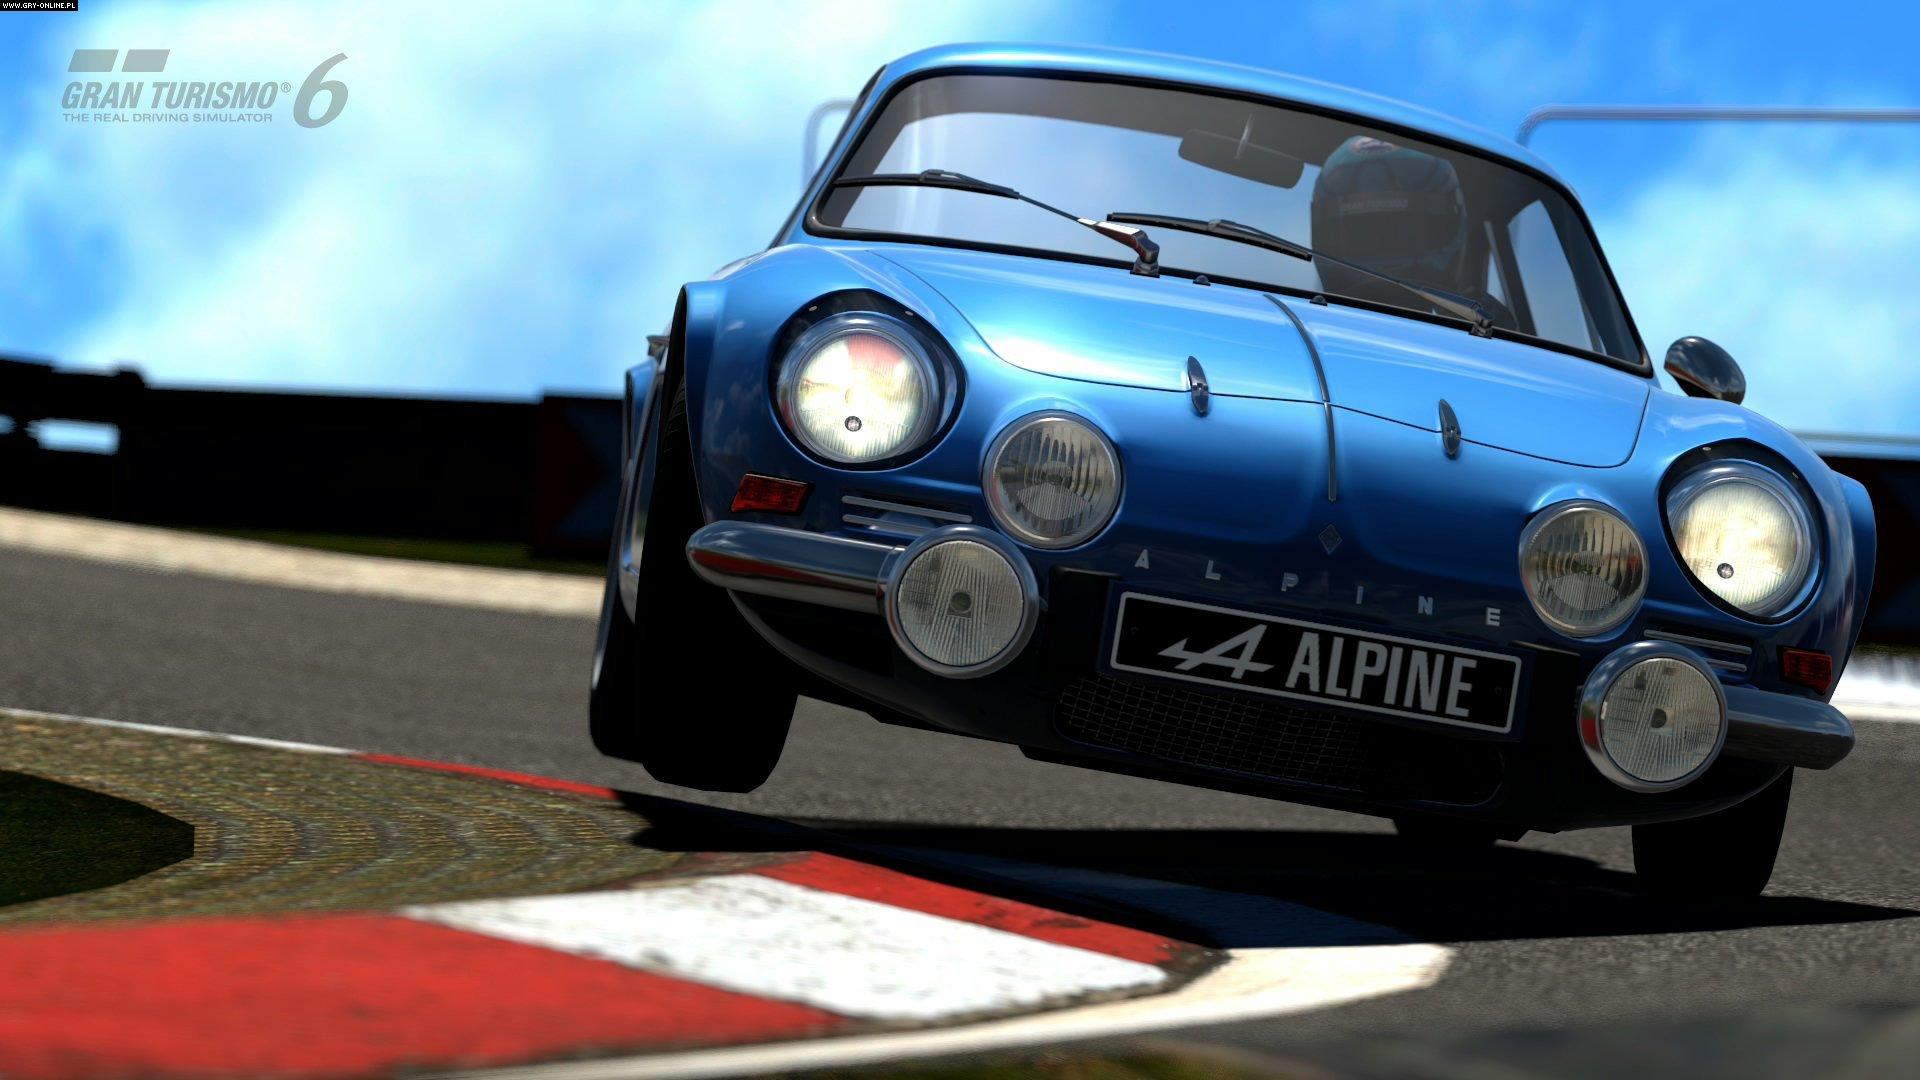 Gran Turismo 6 Hd Wallpaper Background Image 1920x1080